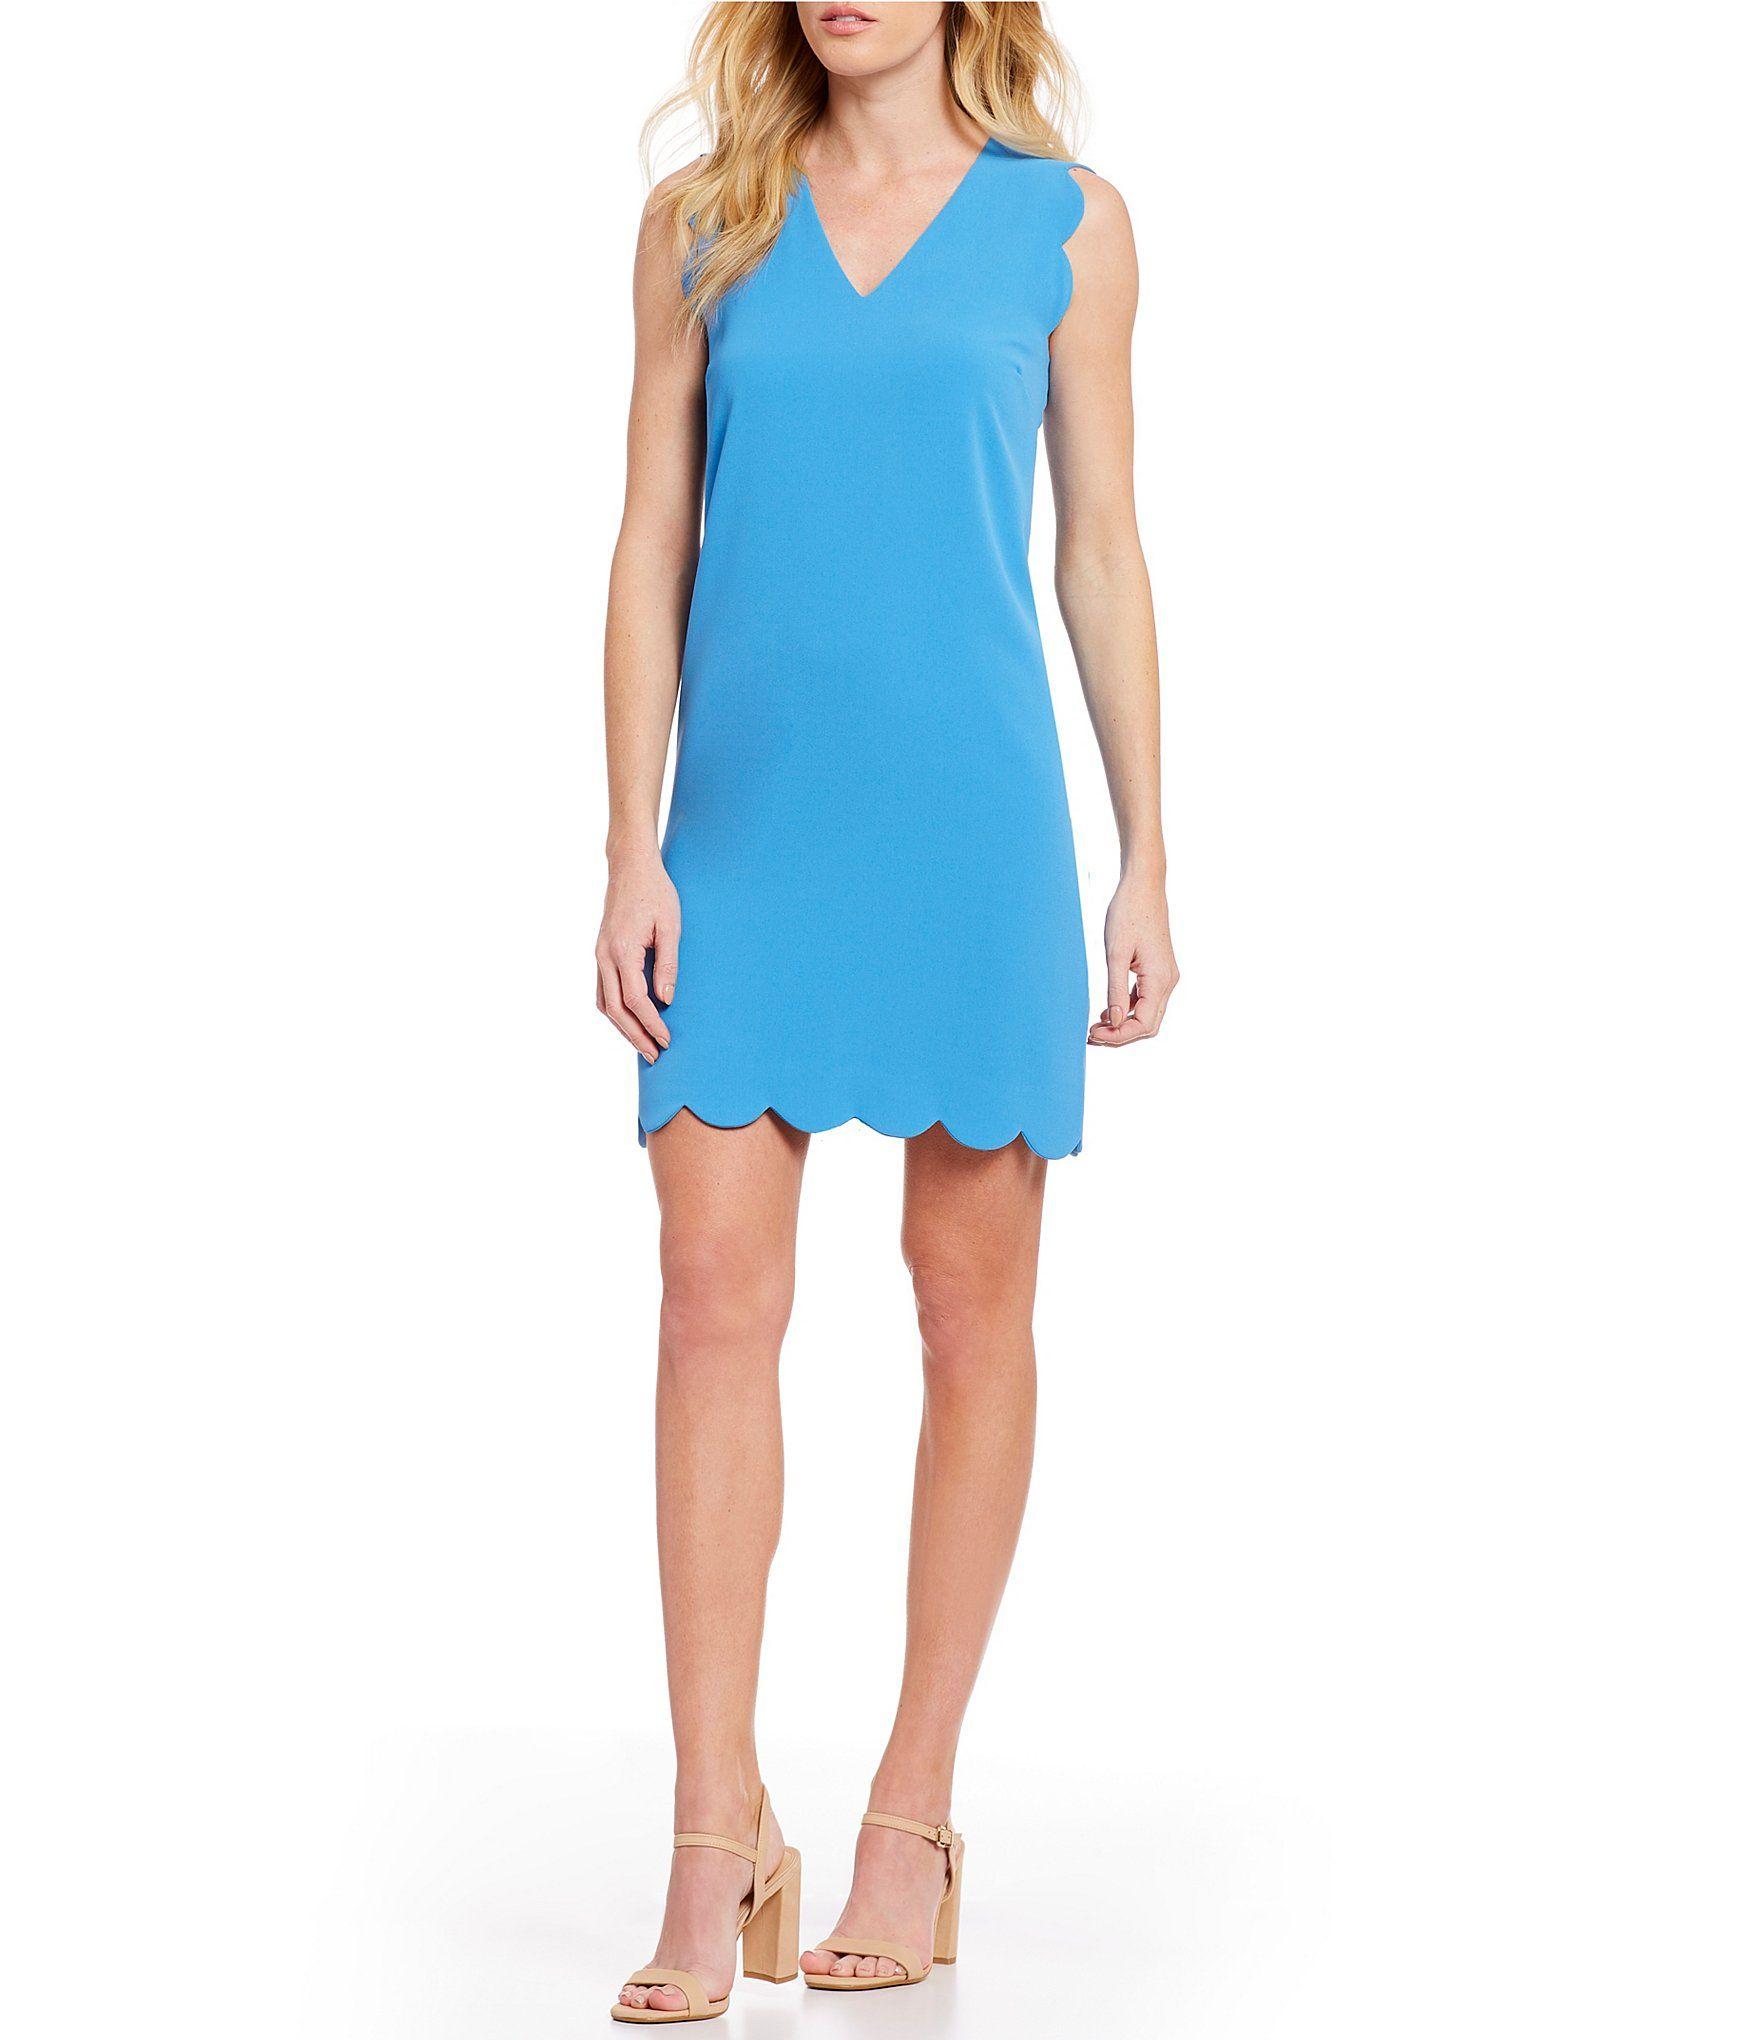 0e2f0aa98f4 Shop for CeCe Sleeveless V-Neck Scalloped Shift Dress at Dillards.com. Visit